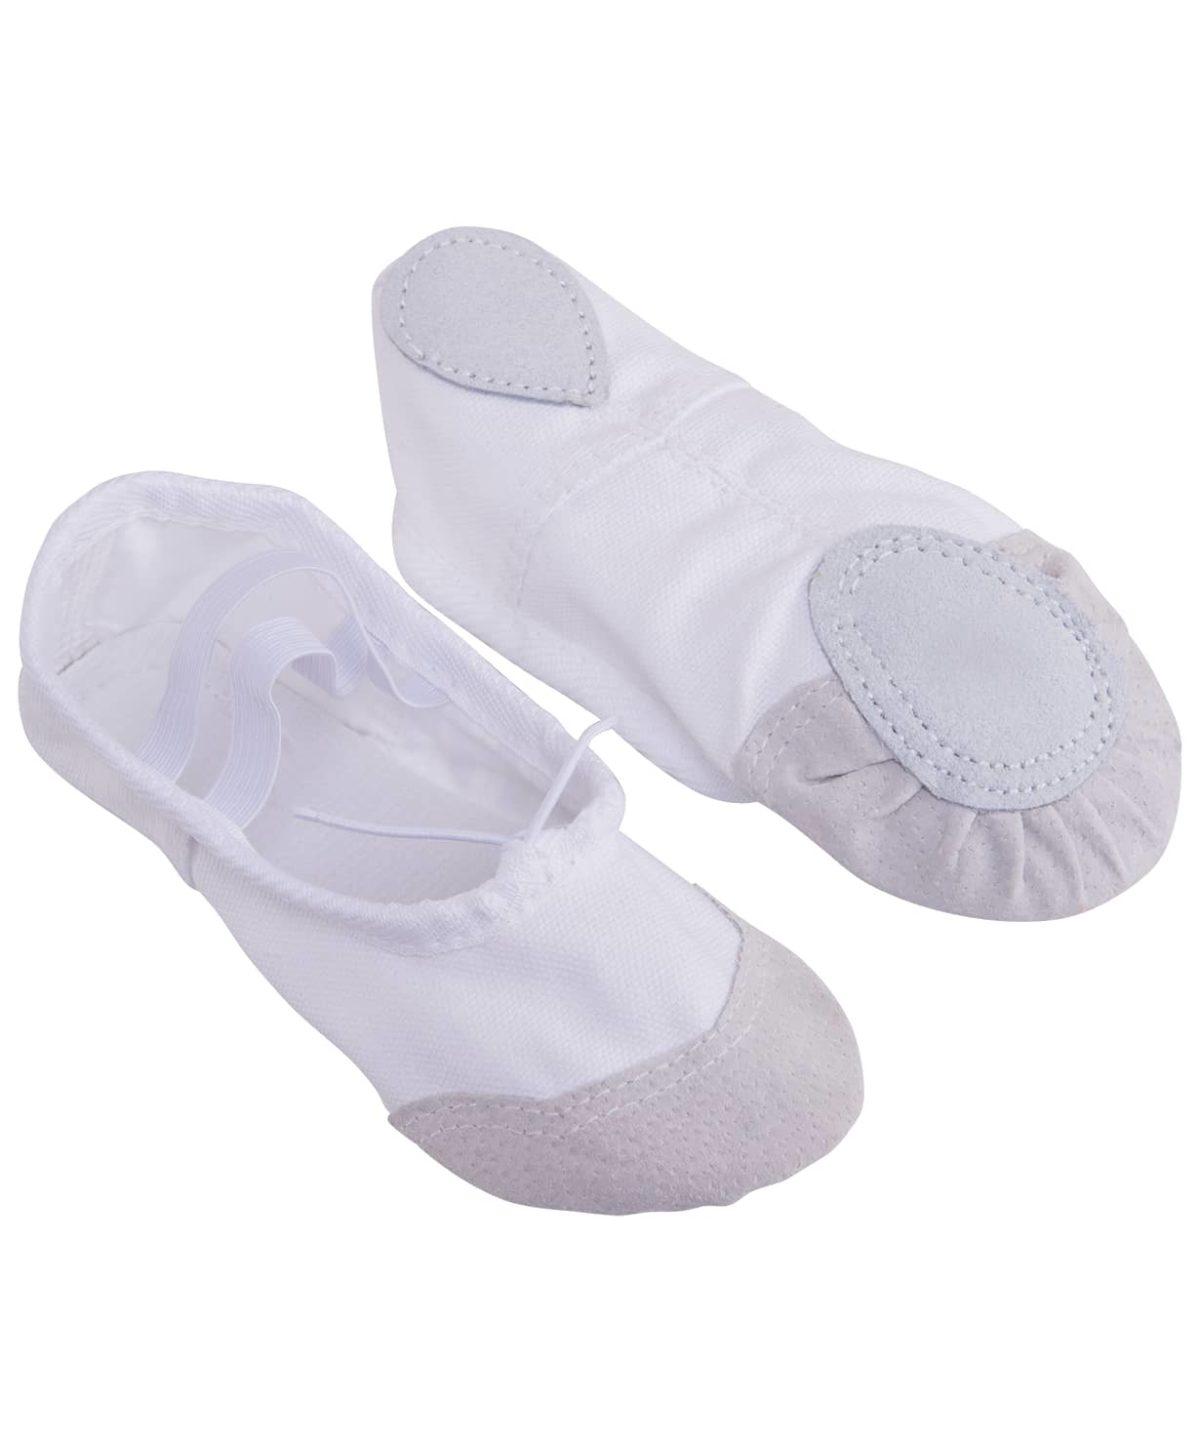 AMELY Балетки текстиль (32-37)  SL-01: белый - 1